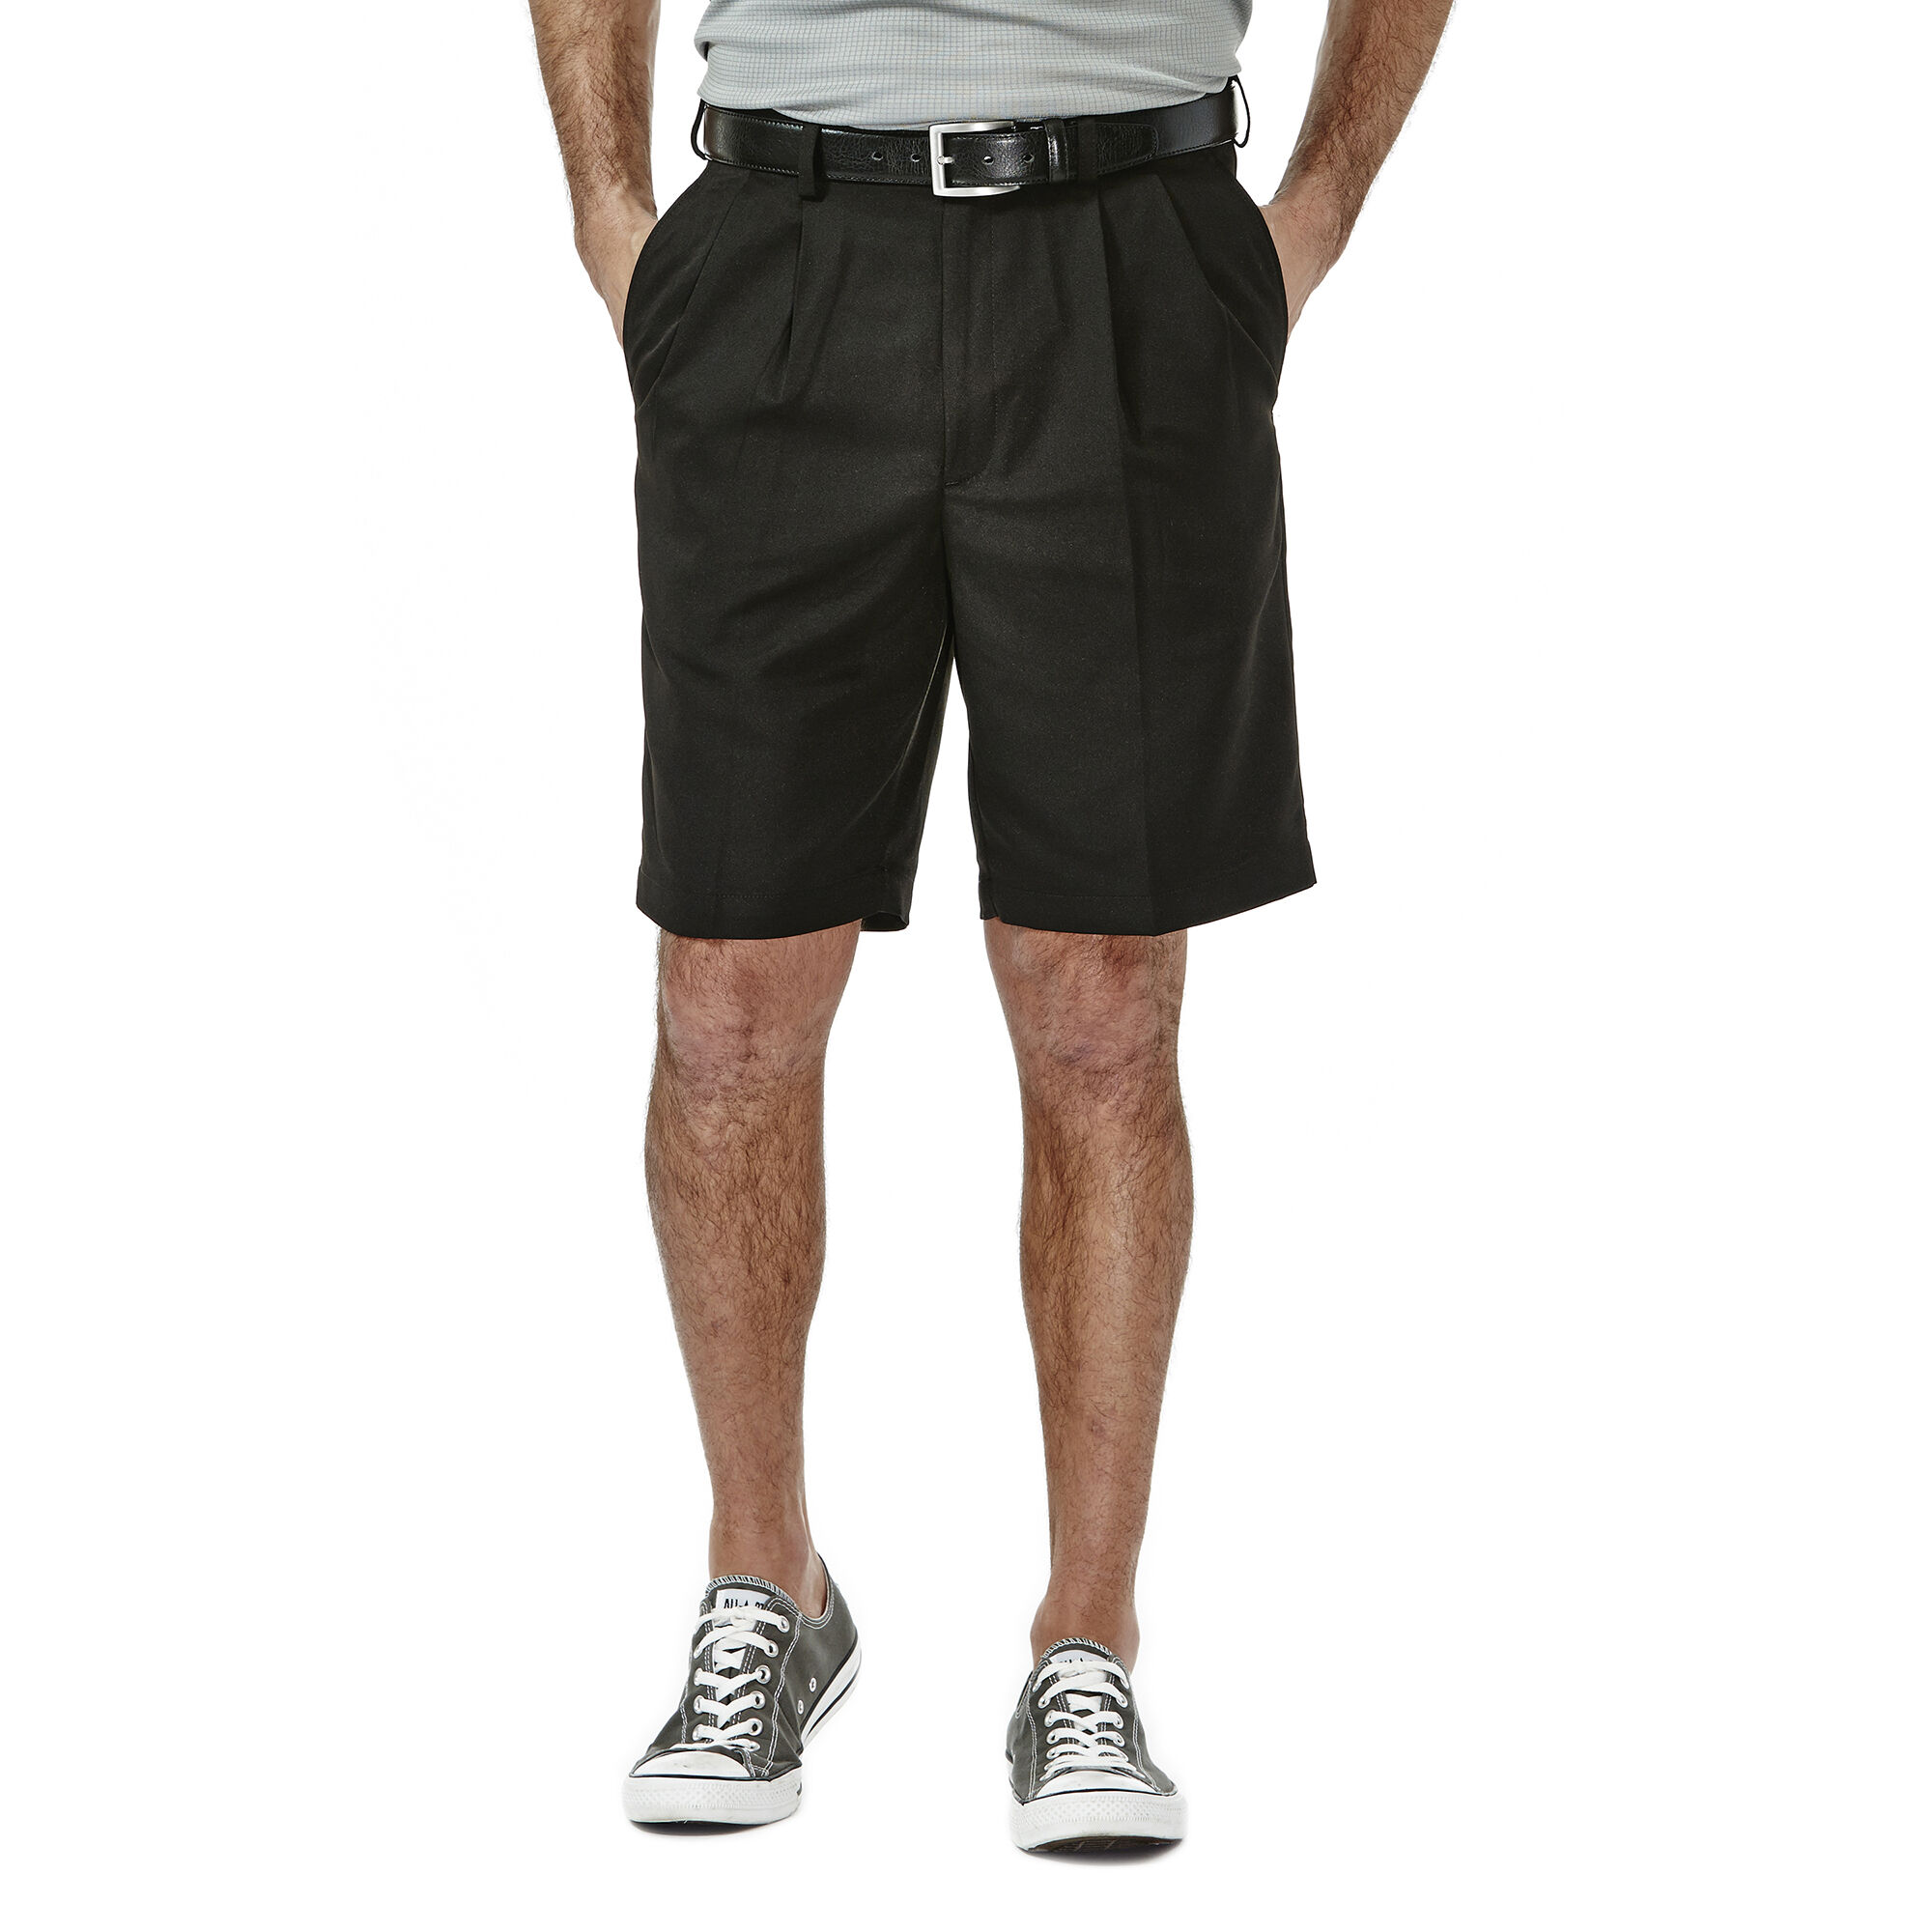 Cool 18 174 Shorts